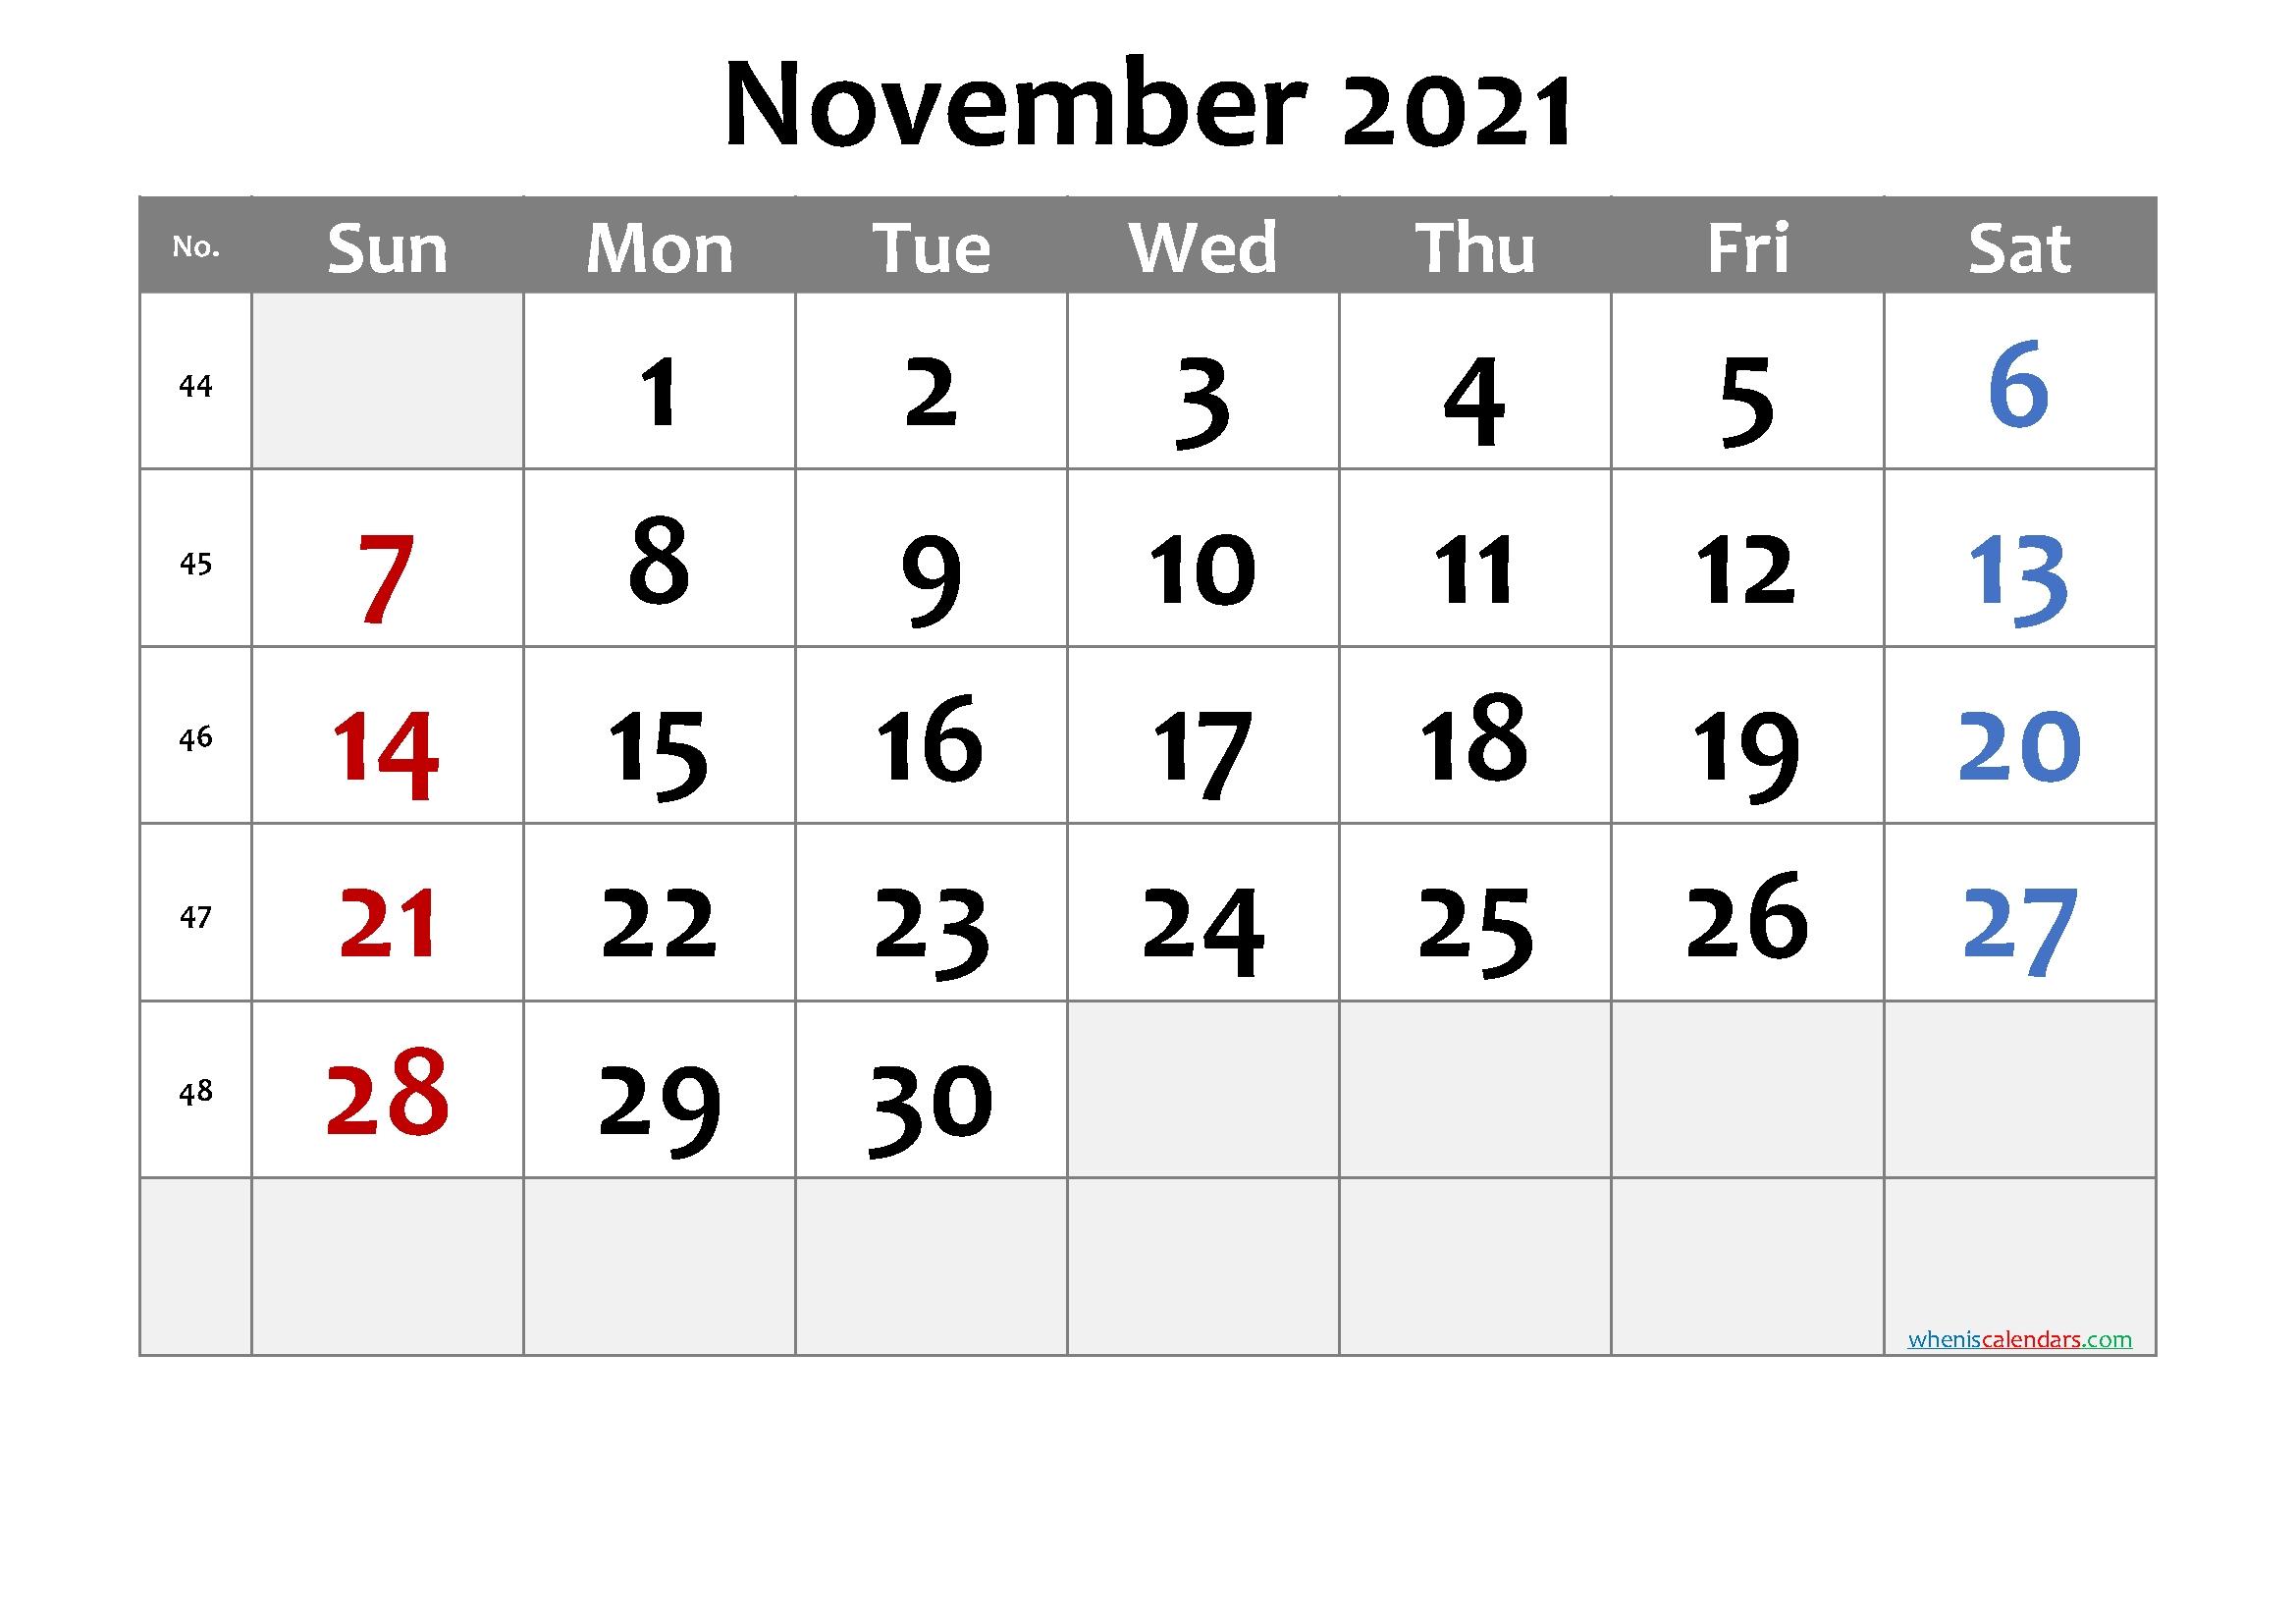 Free November 2021 Calendar - 6 Templates | Free Printable 2020 Calendar With Holidays Free November 2021 Calendar